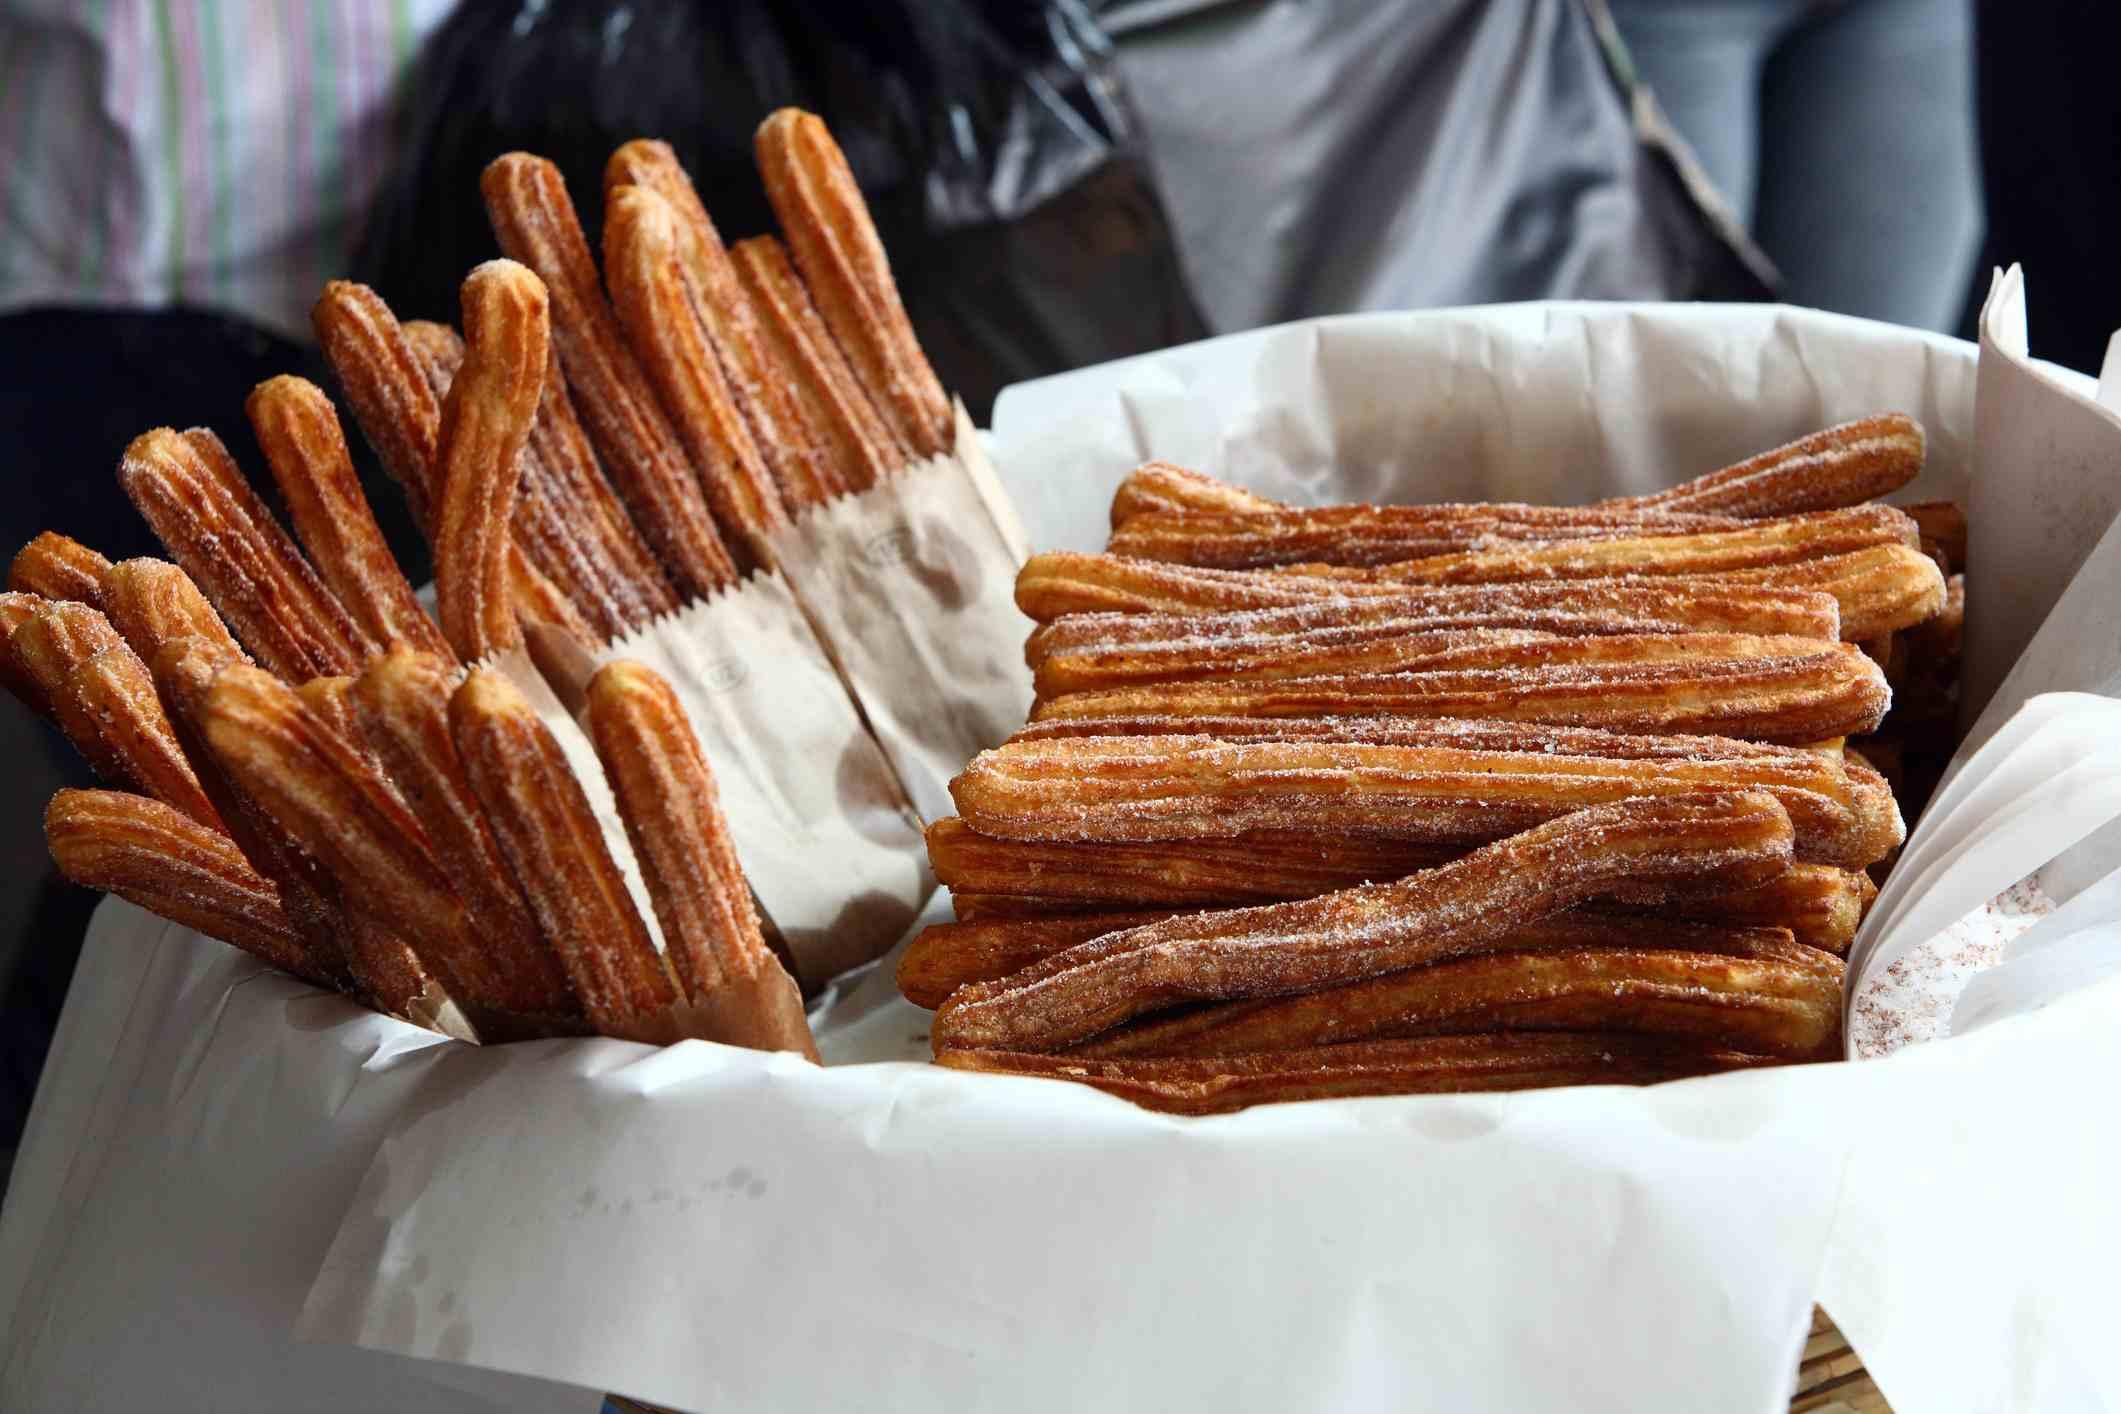 Fresh churros at a street stall